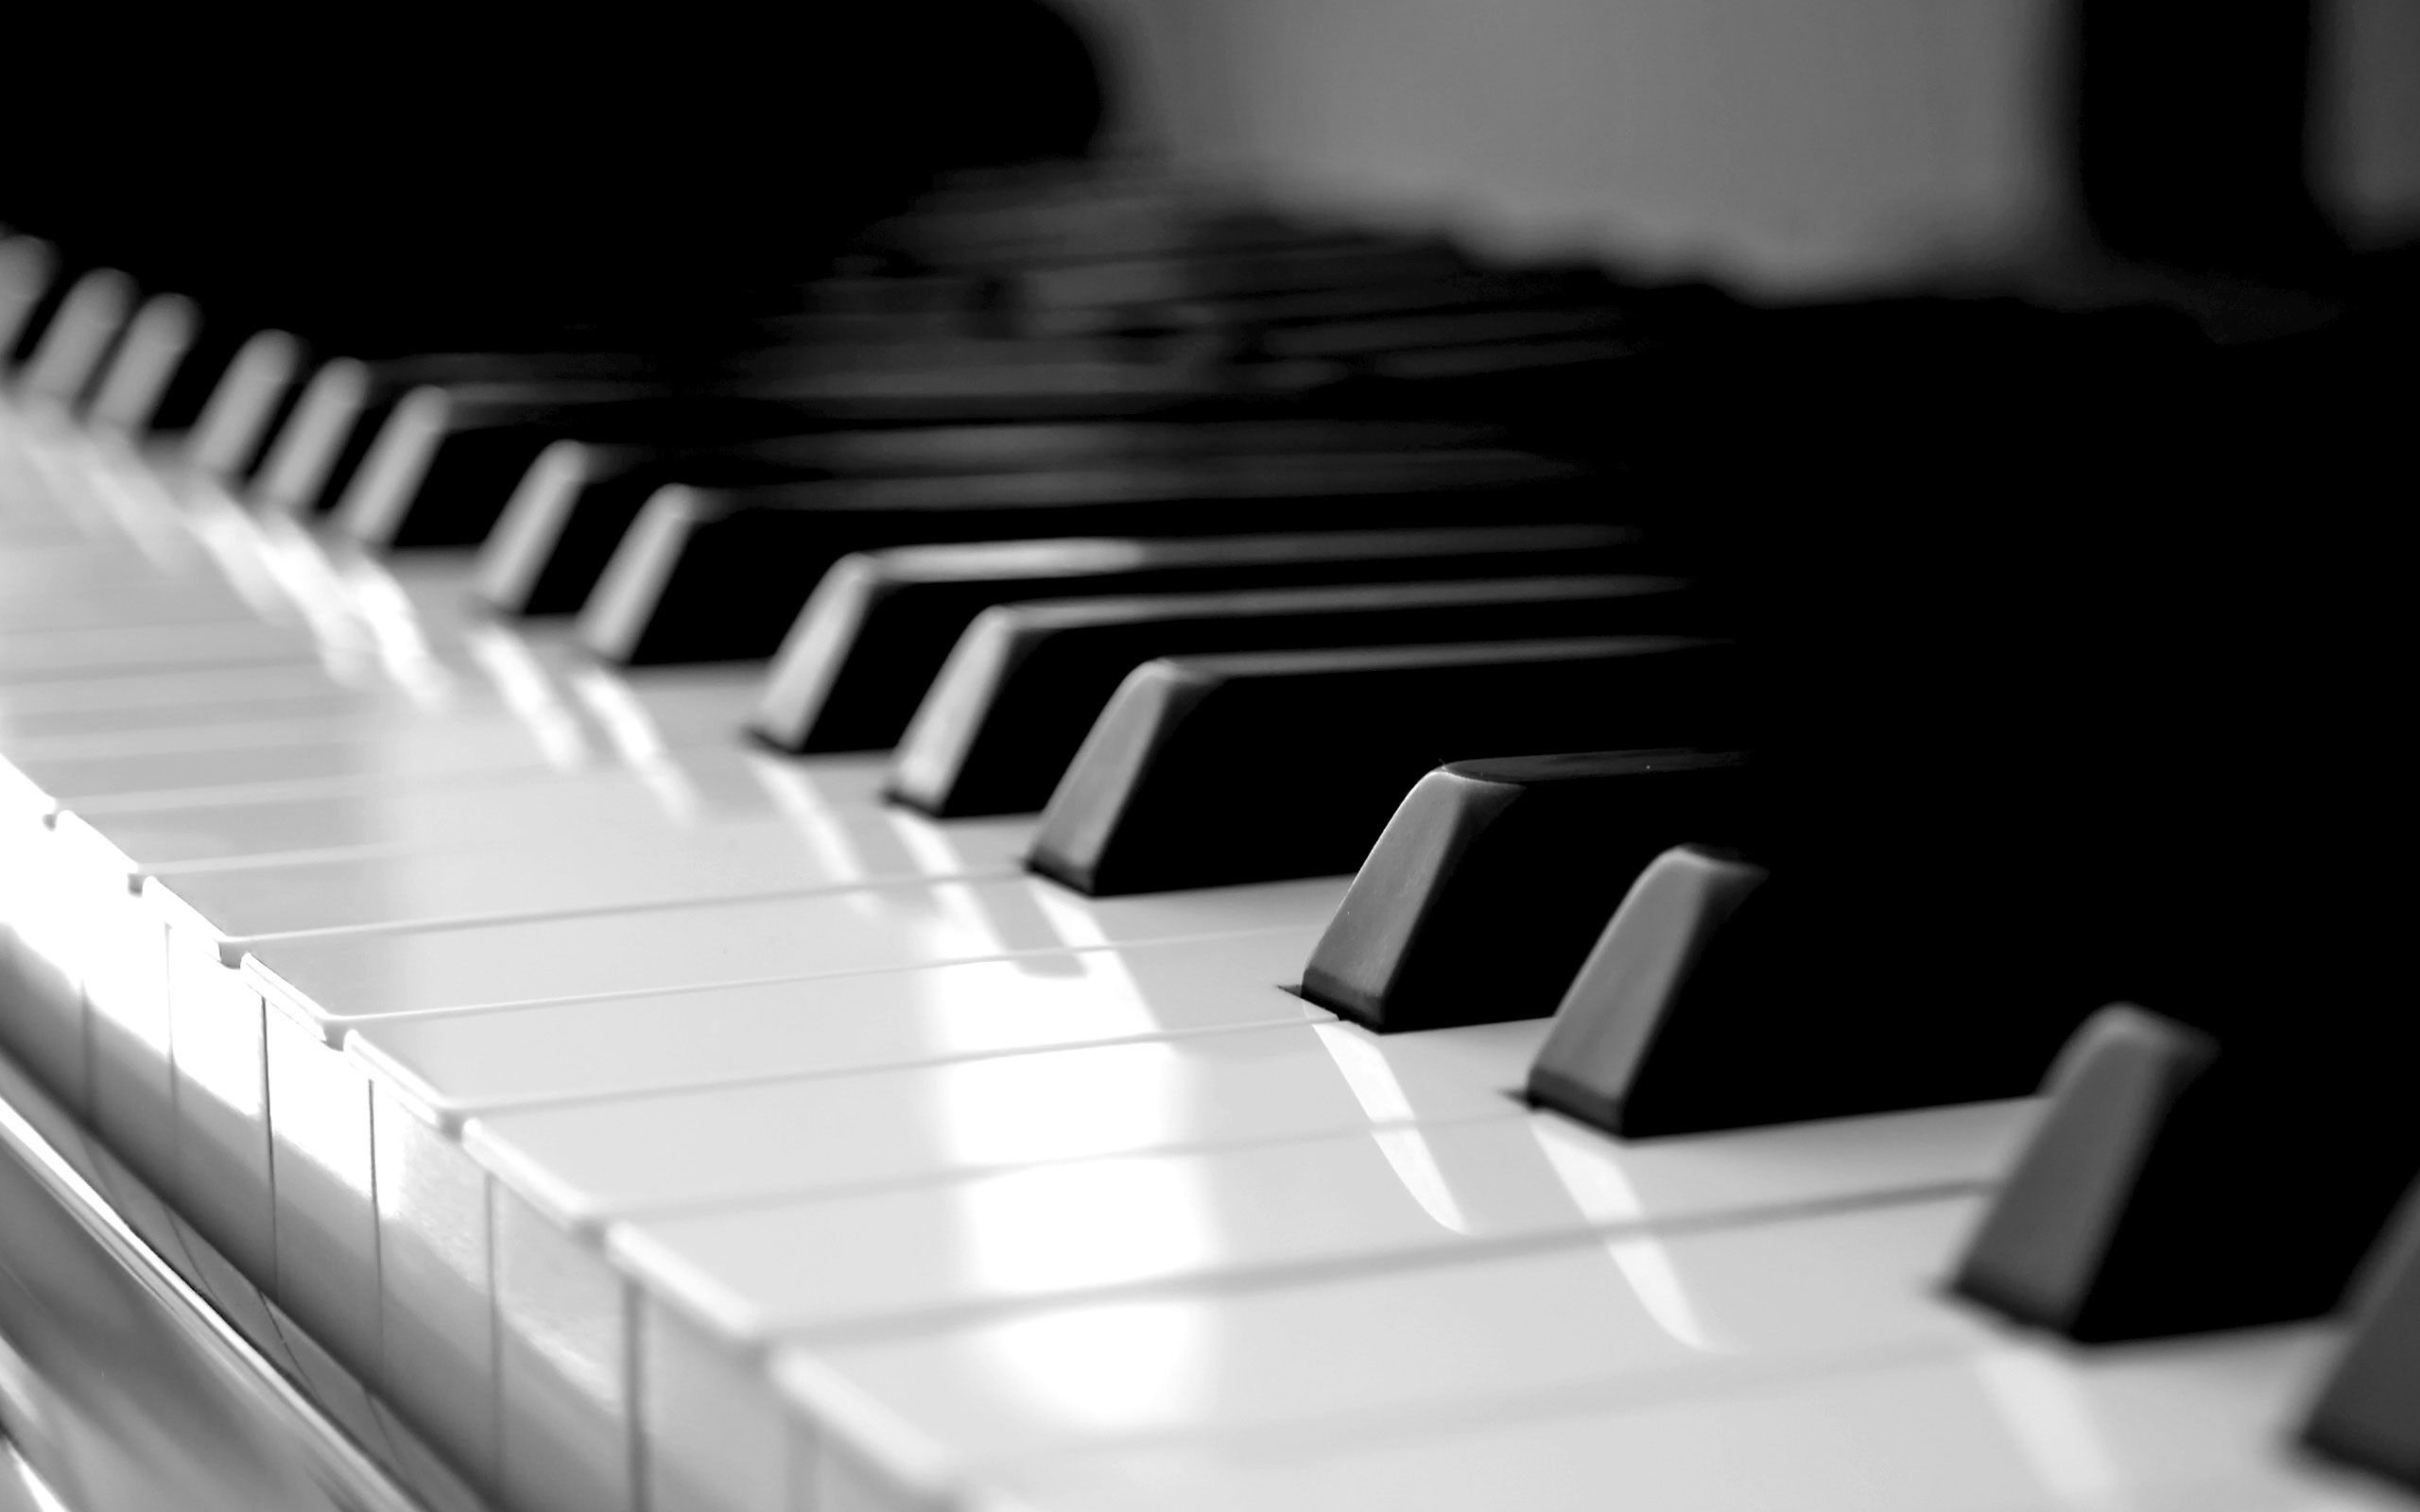 Free Download Hd Piano Wallpaper 2560x1600 Free Download Piano Music Keyboard Learn Piano